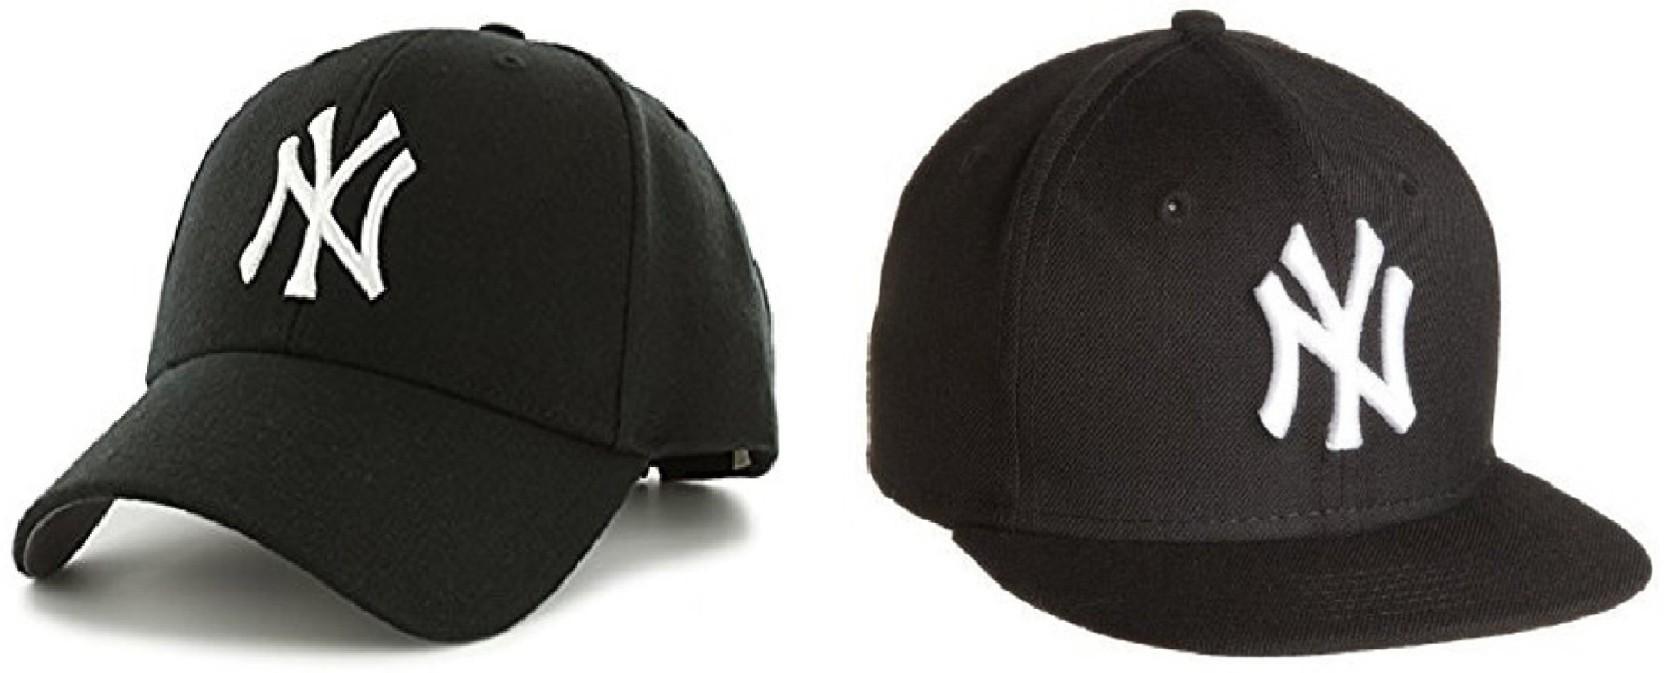 CROSS JAGUAR Embroidered Solid NY Hip Hop Unisex Cap Cotton Snapback  Baseball (Pack Of 2 37c5528f3196